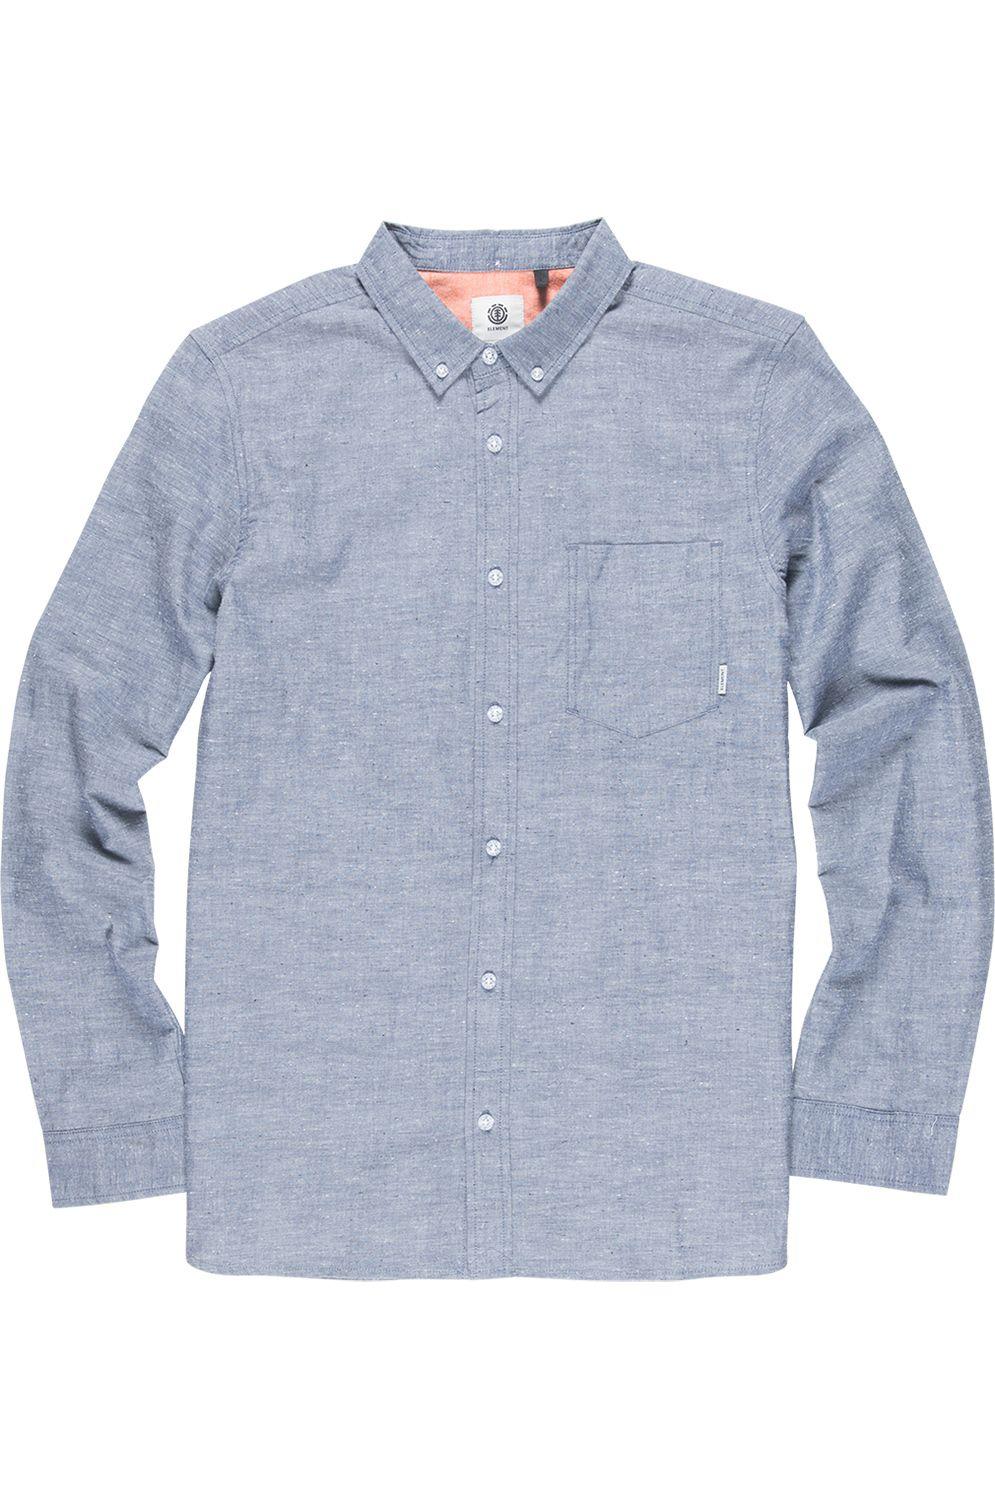 Element Shirt GREENE NEPS LS FOUNDATION Navy